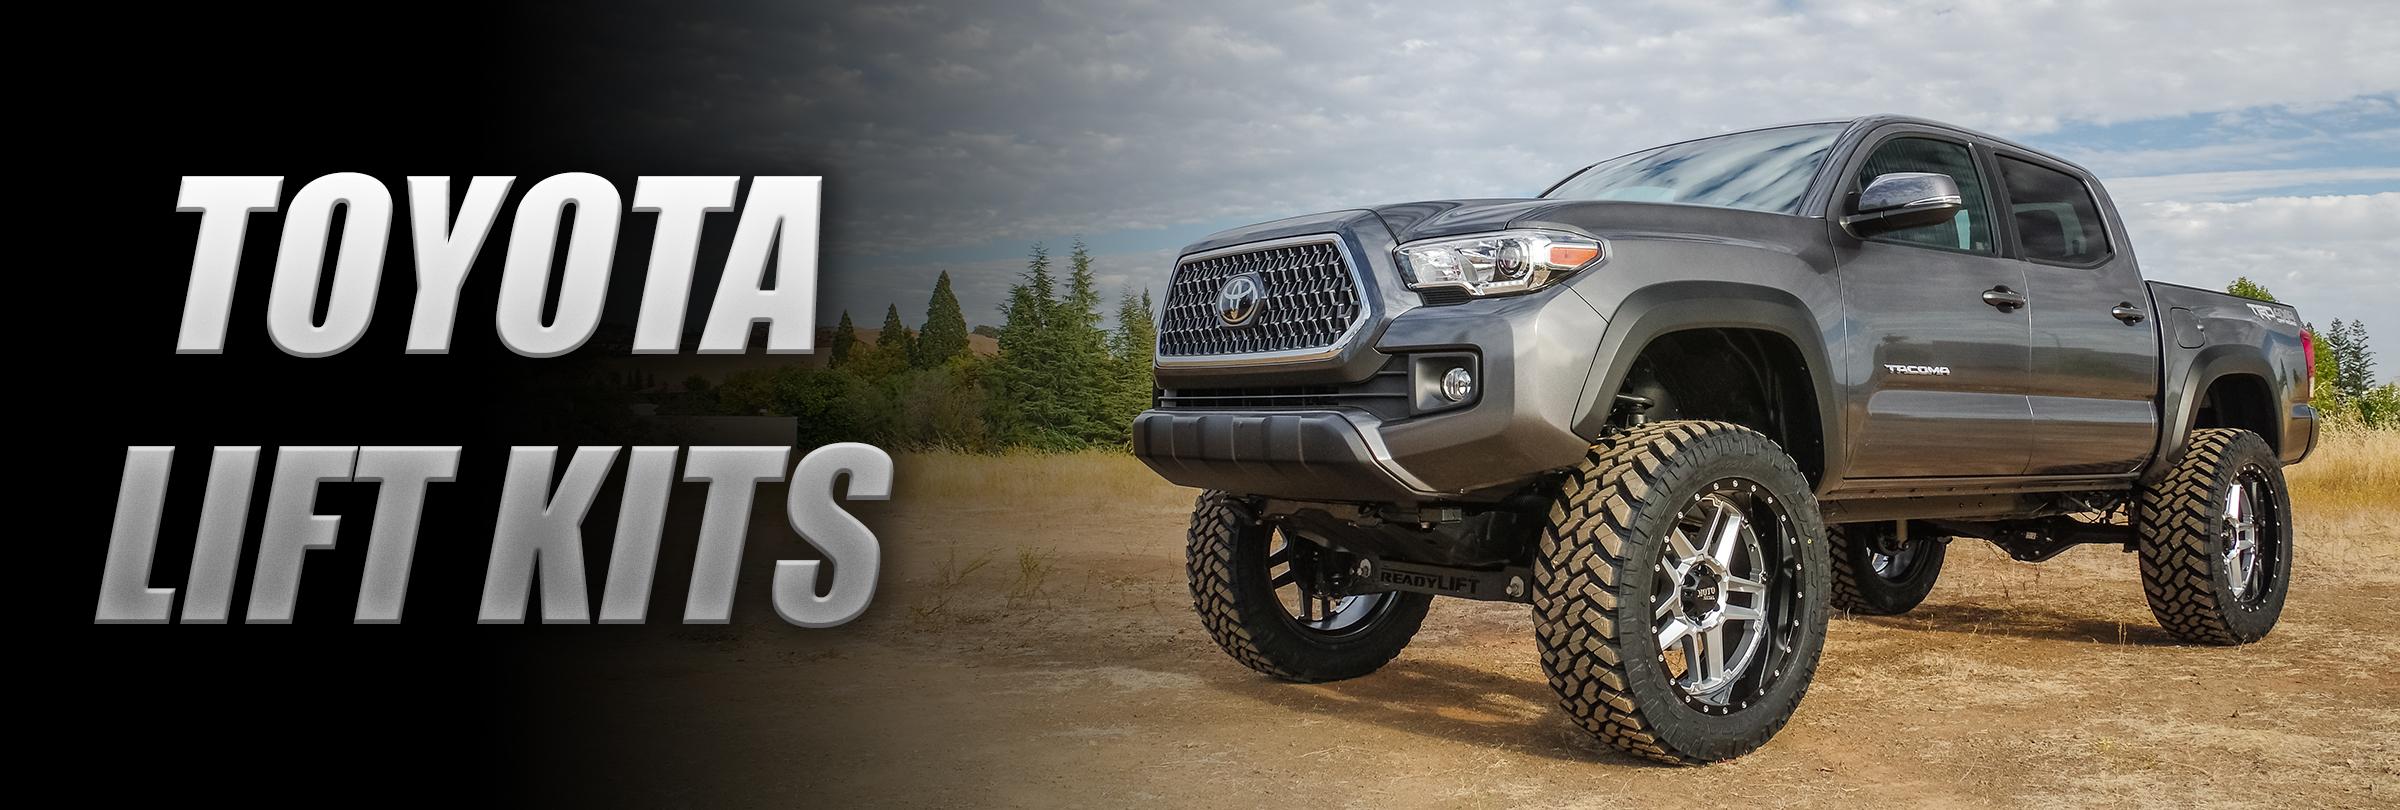 ReadyLIFT | Toyota